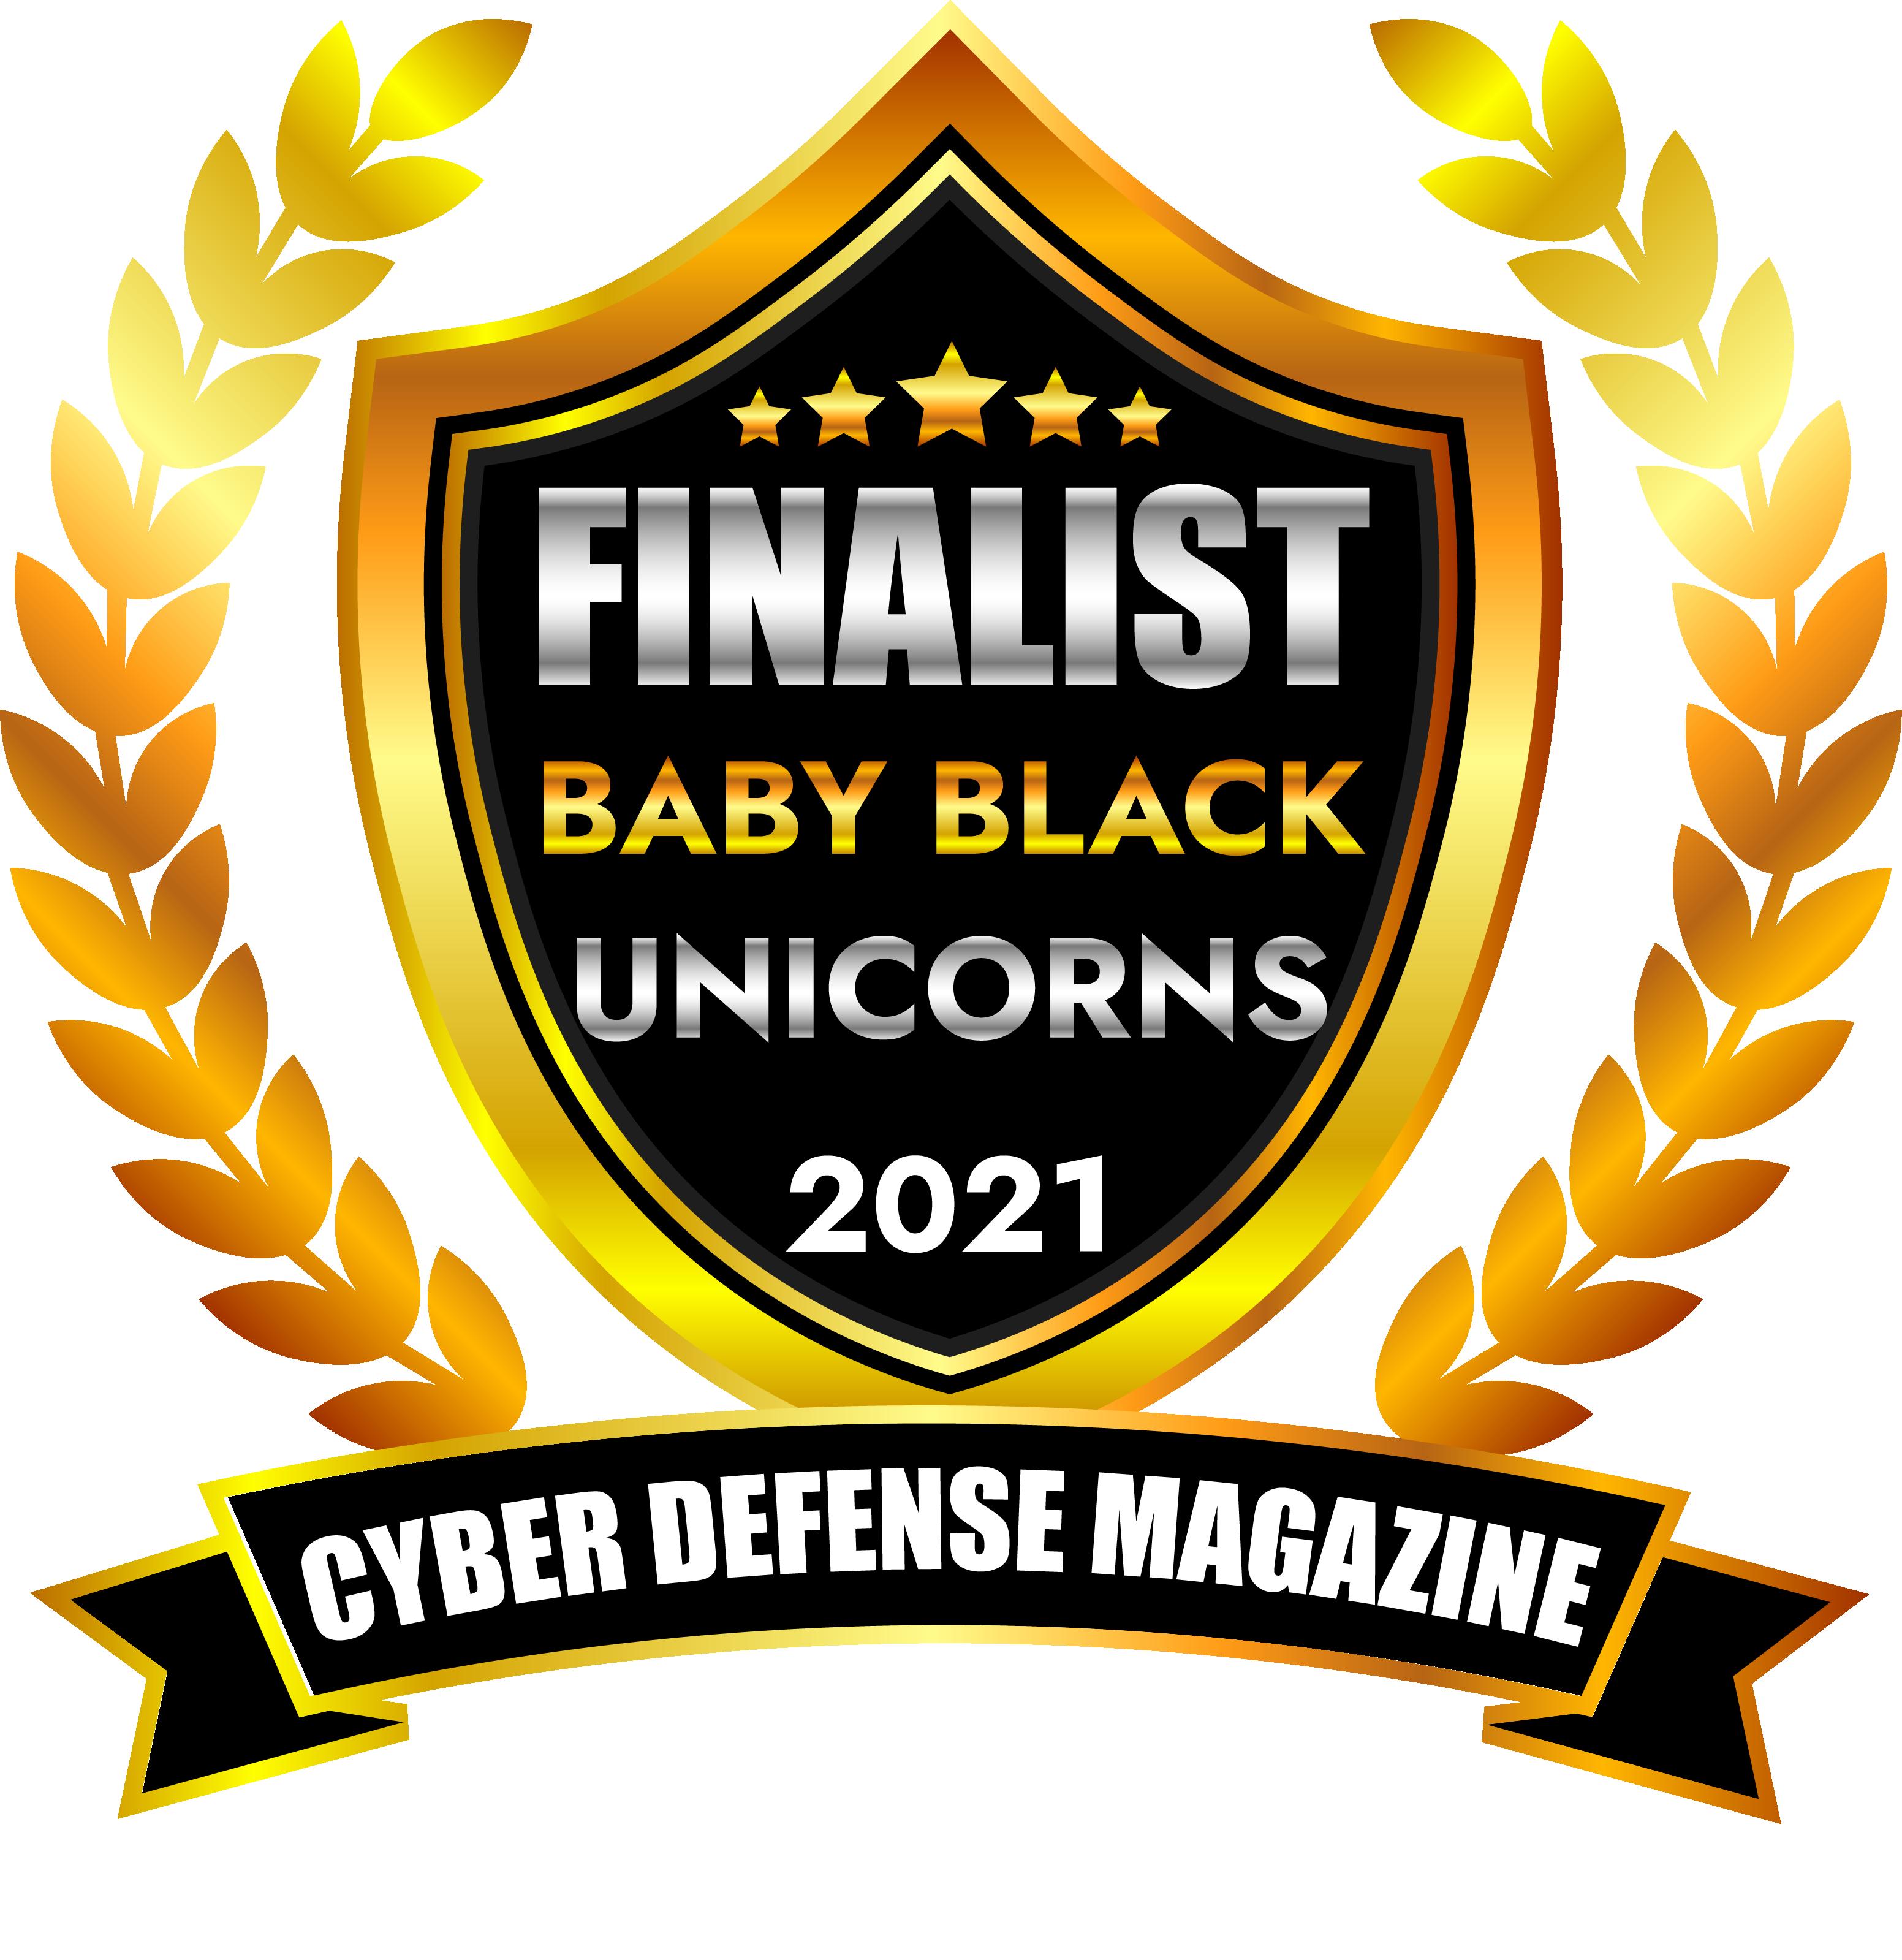 TRUU NAMED FINALIST IN 2021 BLACK UNICORN AWARDS